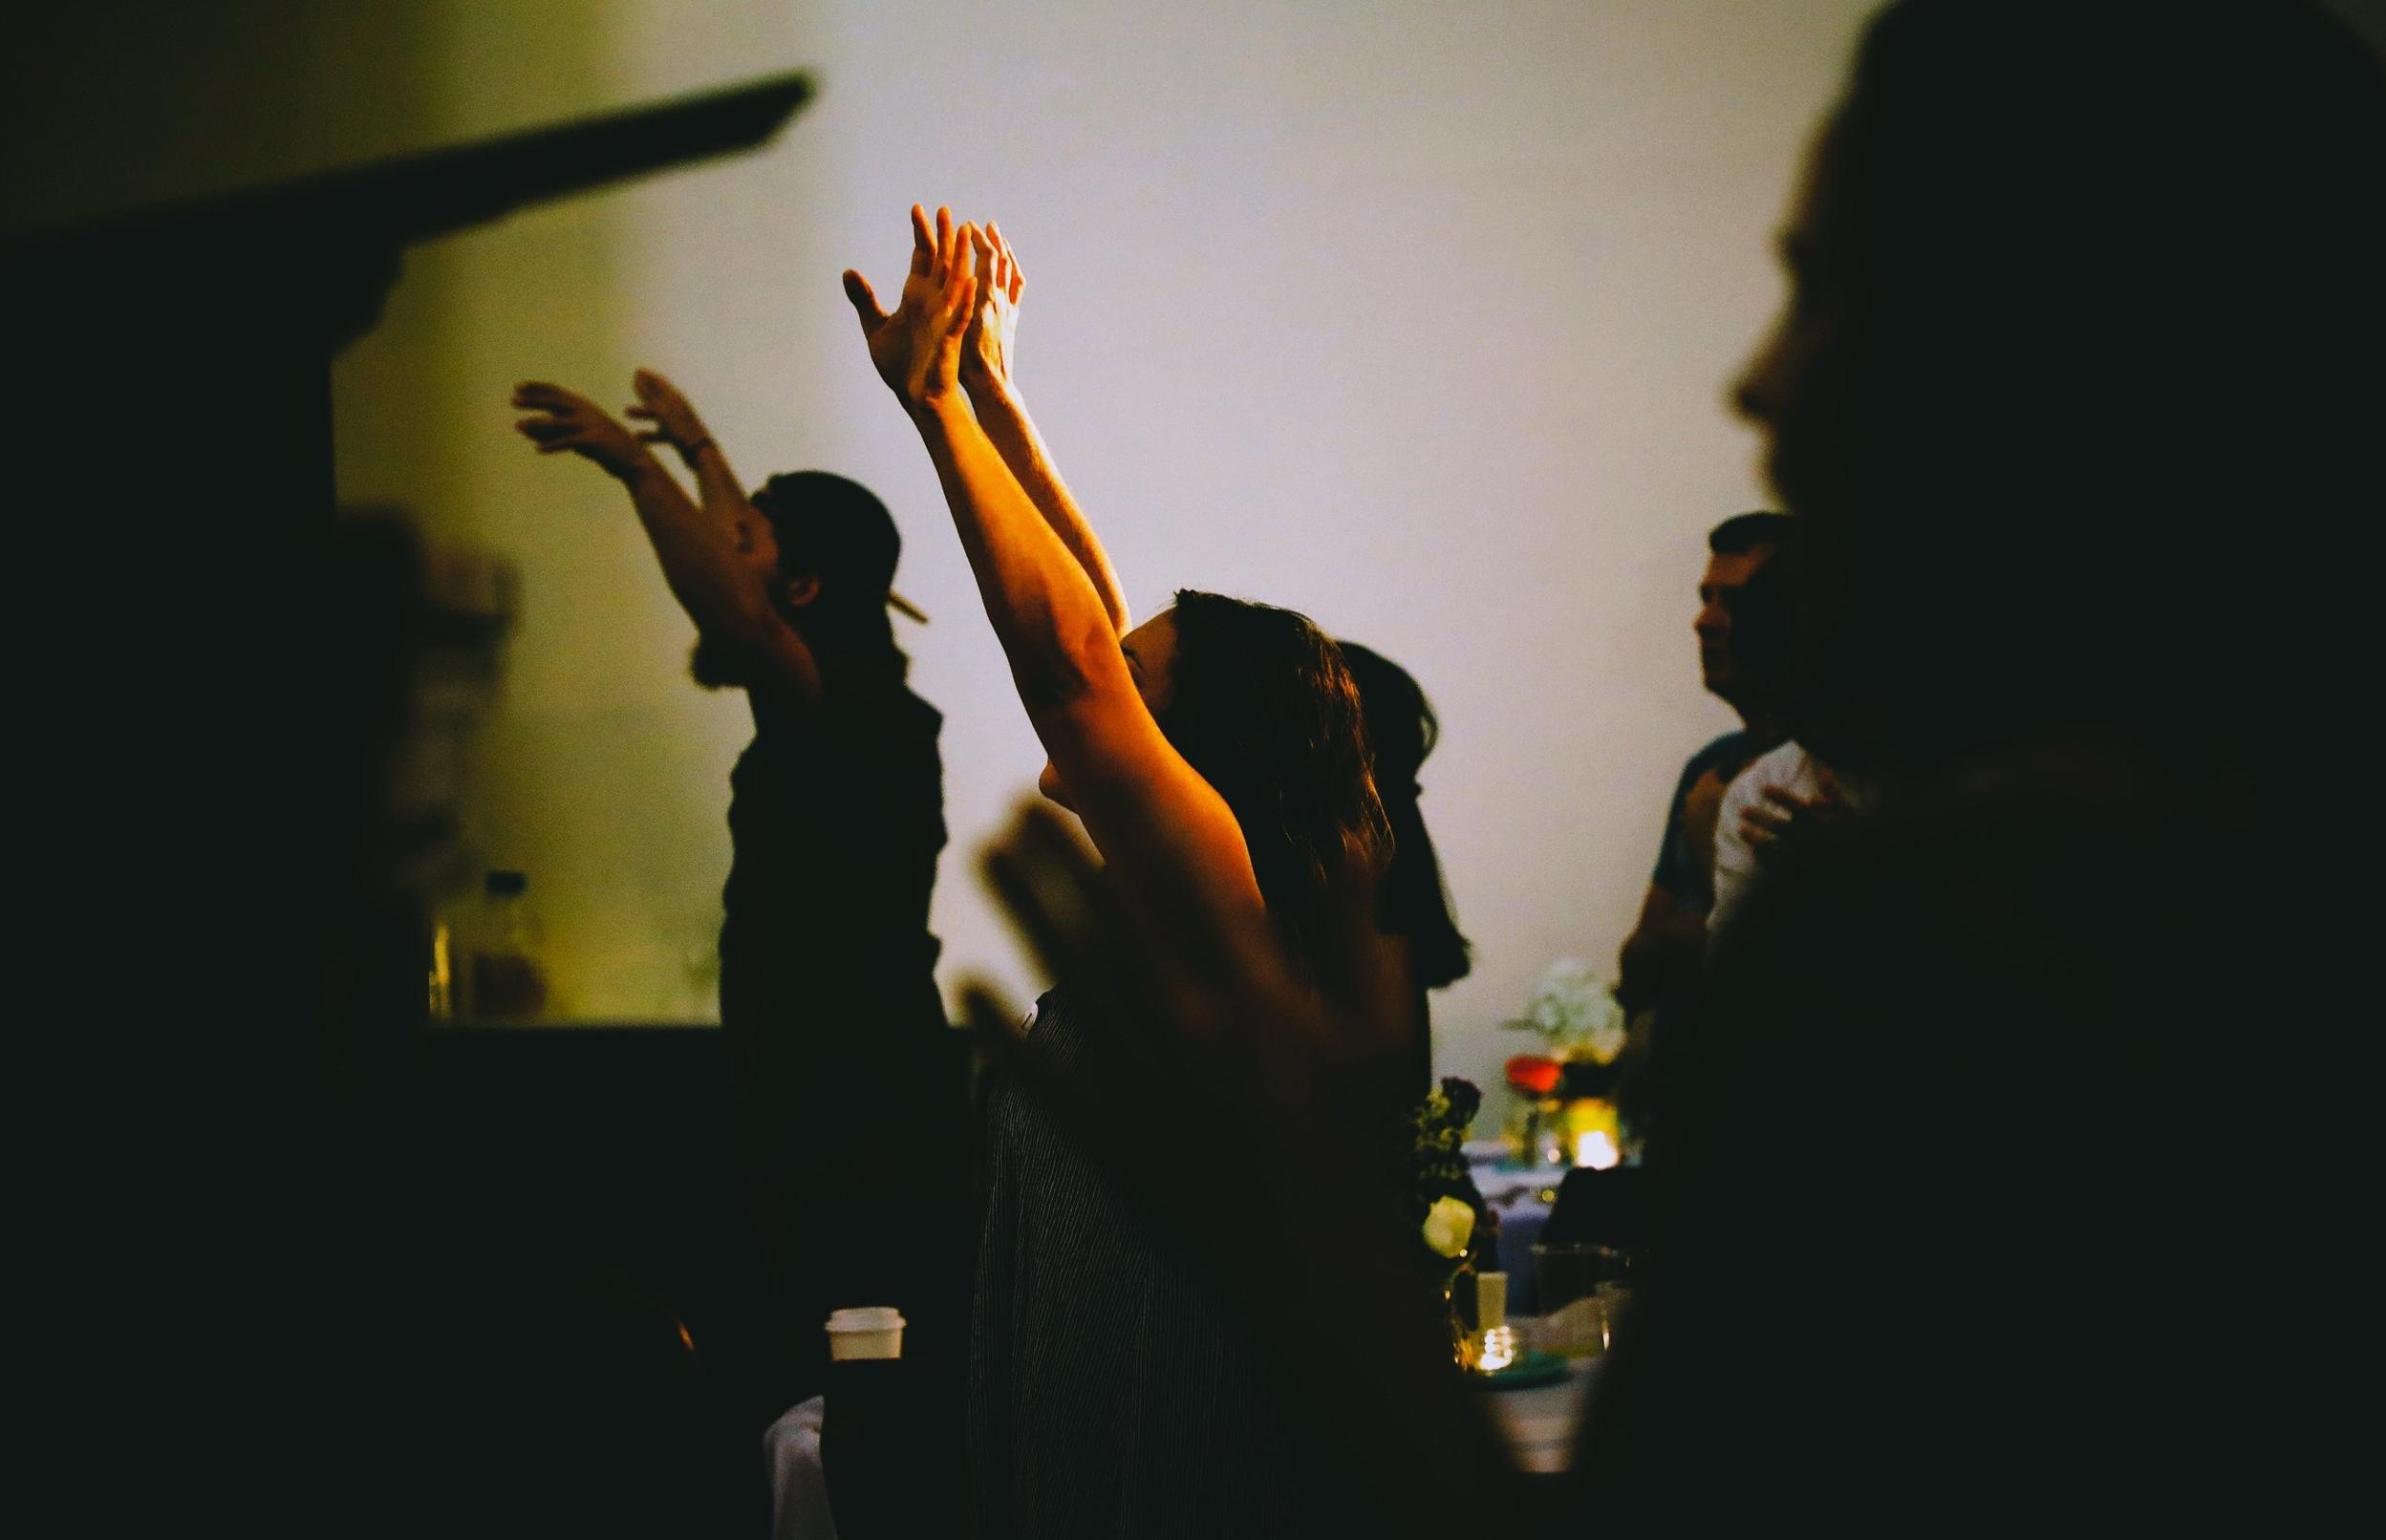 Church_Worship_jon-tyson-353854.jpg